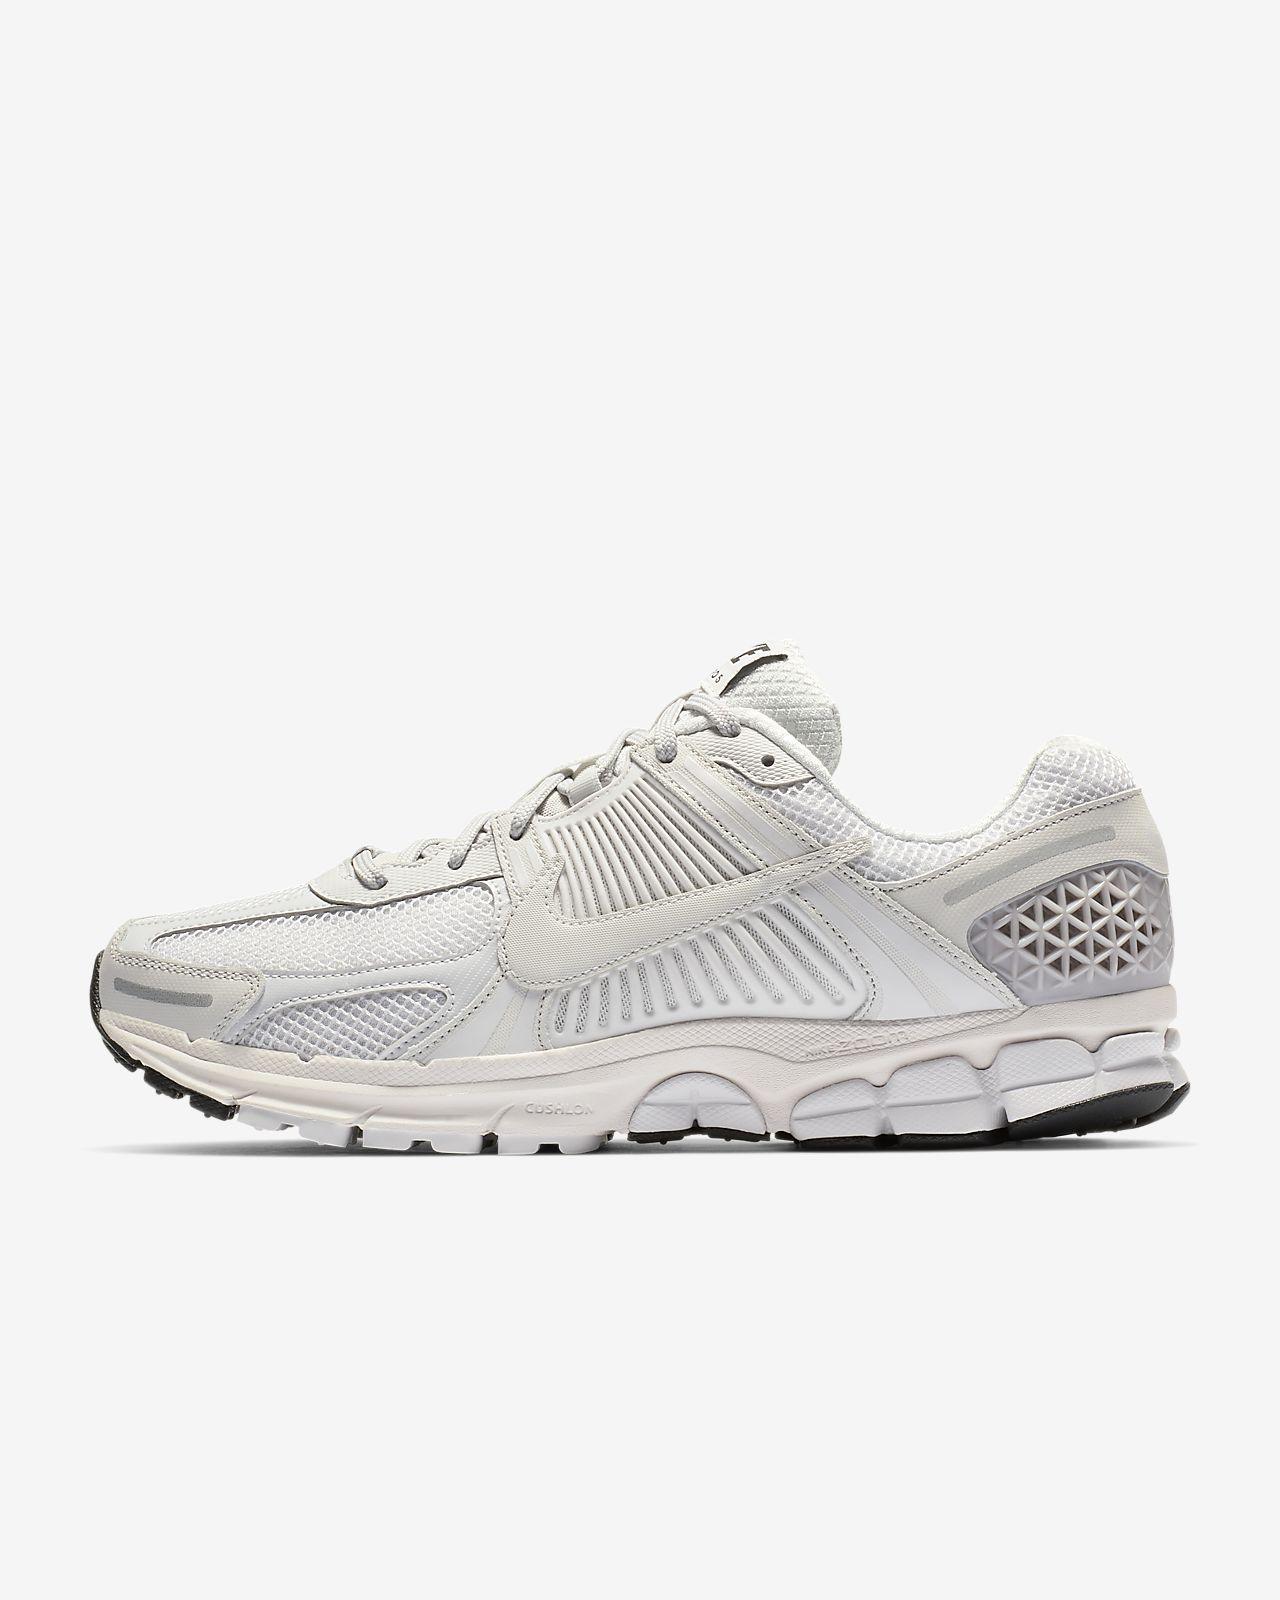 5b00943992355 Nike Zoom Vomero 5 SP Men s Shoe. Nike.com ID